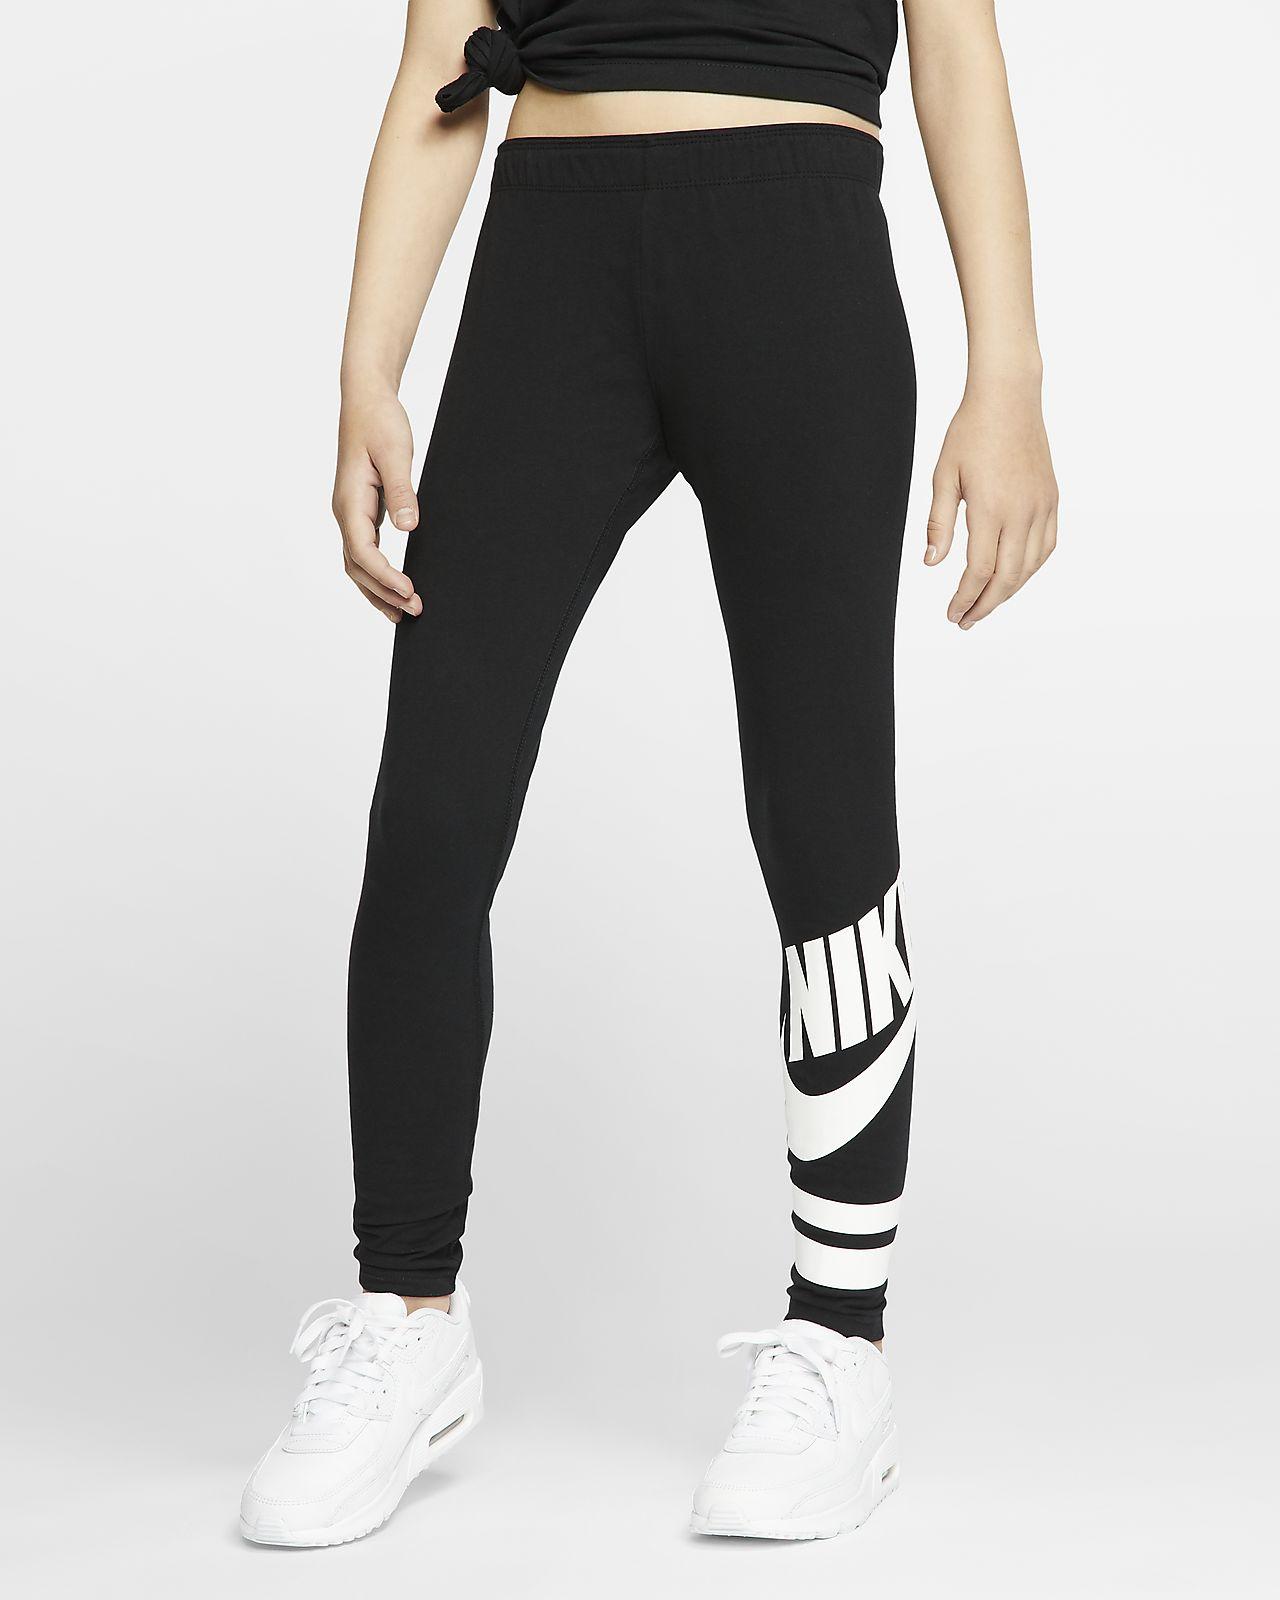 Nike Sportswear 大童(女孩)印花紧身裤